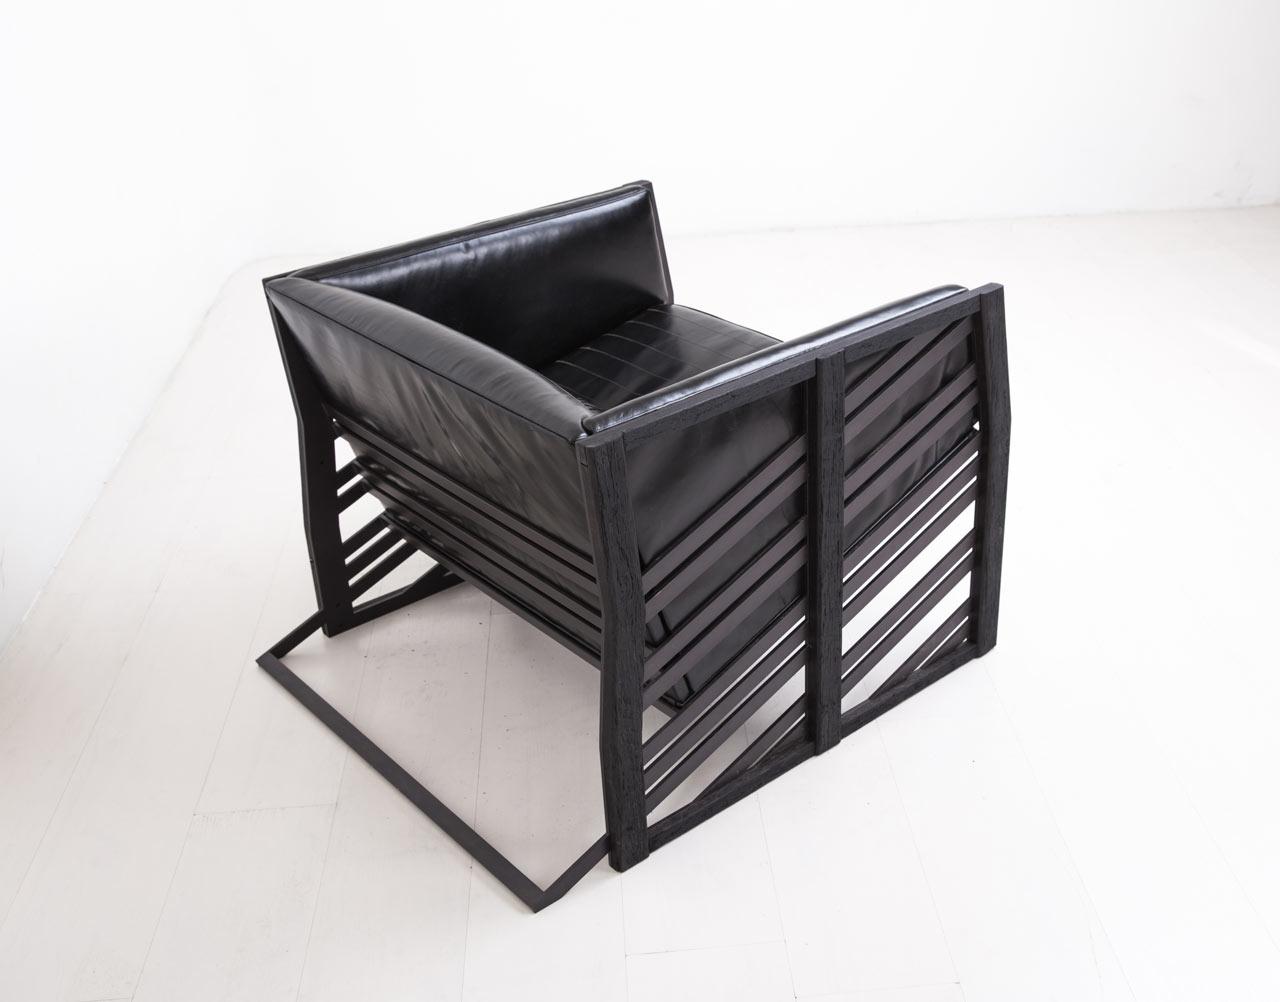 uhuru-gardesgard-lounge-chair-4